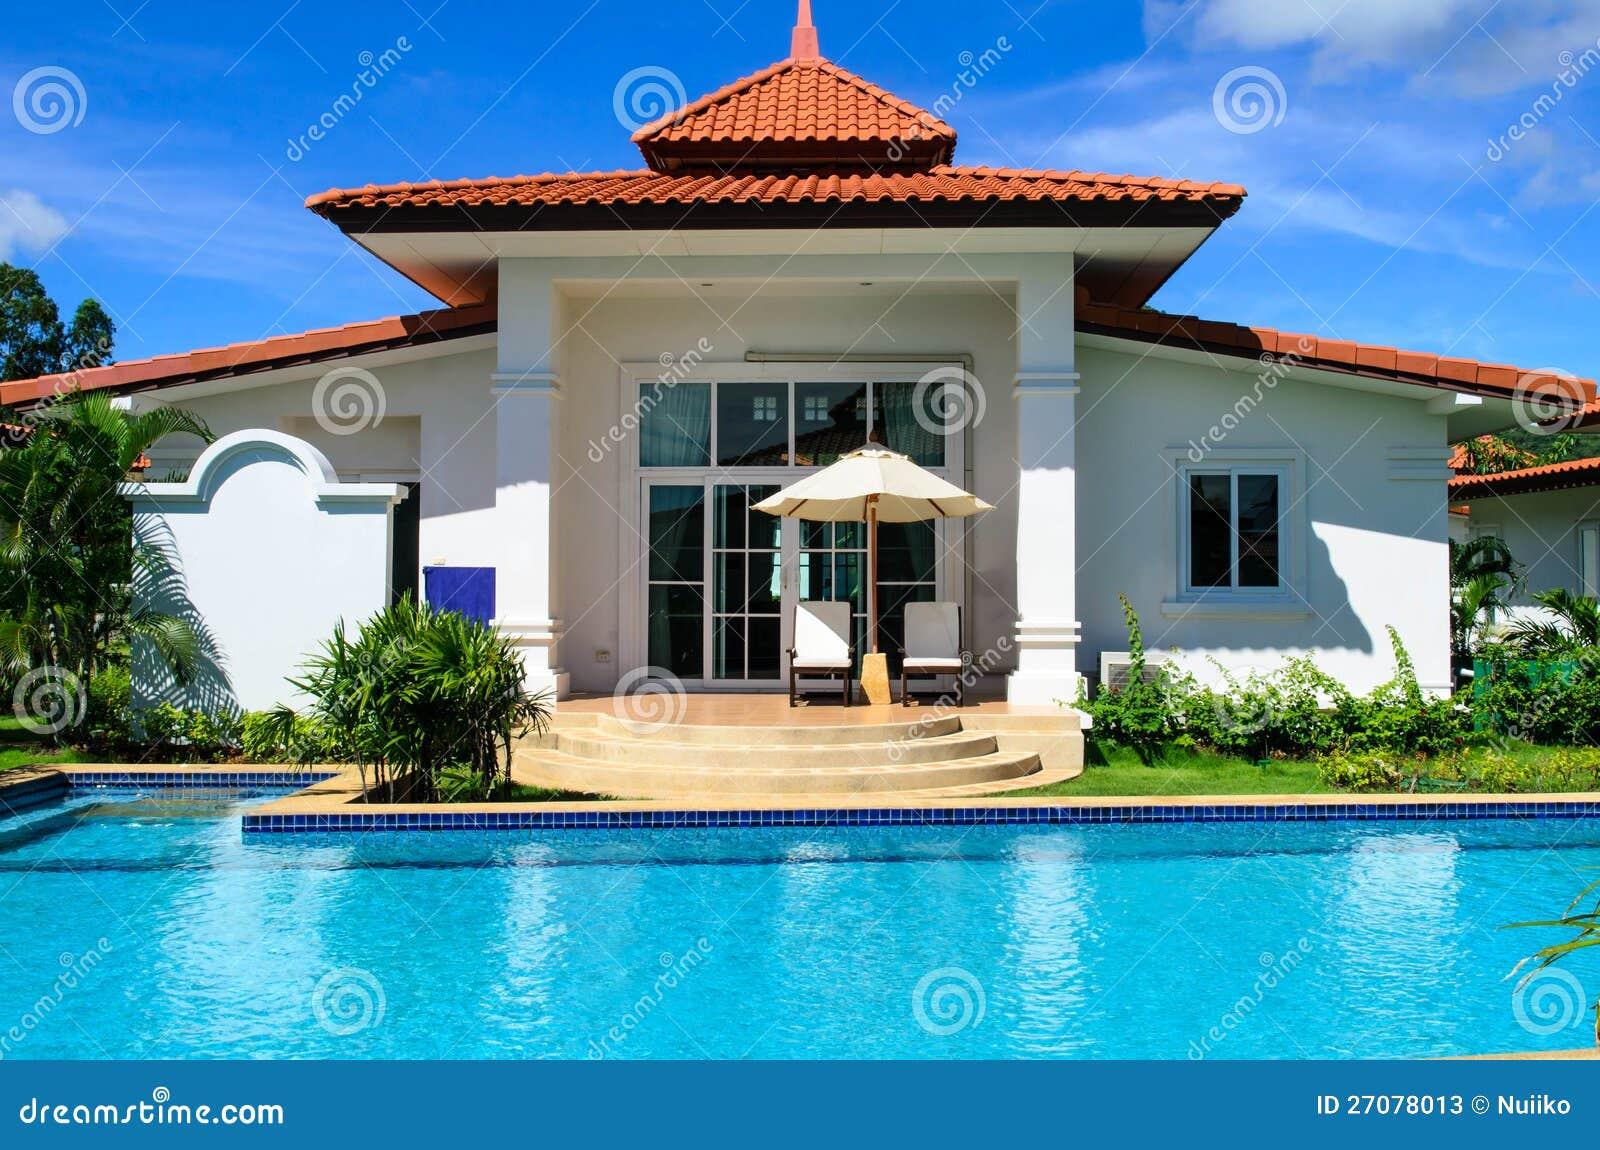 Traumhaus mit pool  Traumhaus Mit Pool Stockfotos - Bild: 27078013